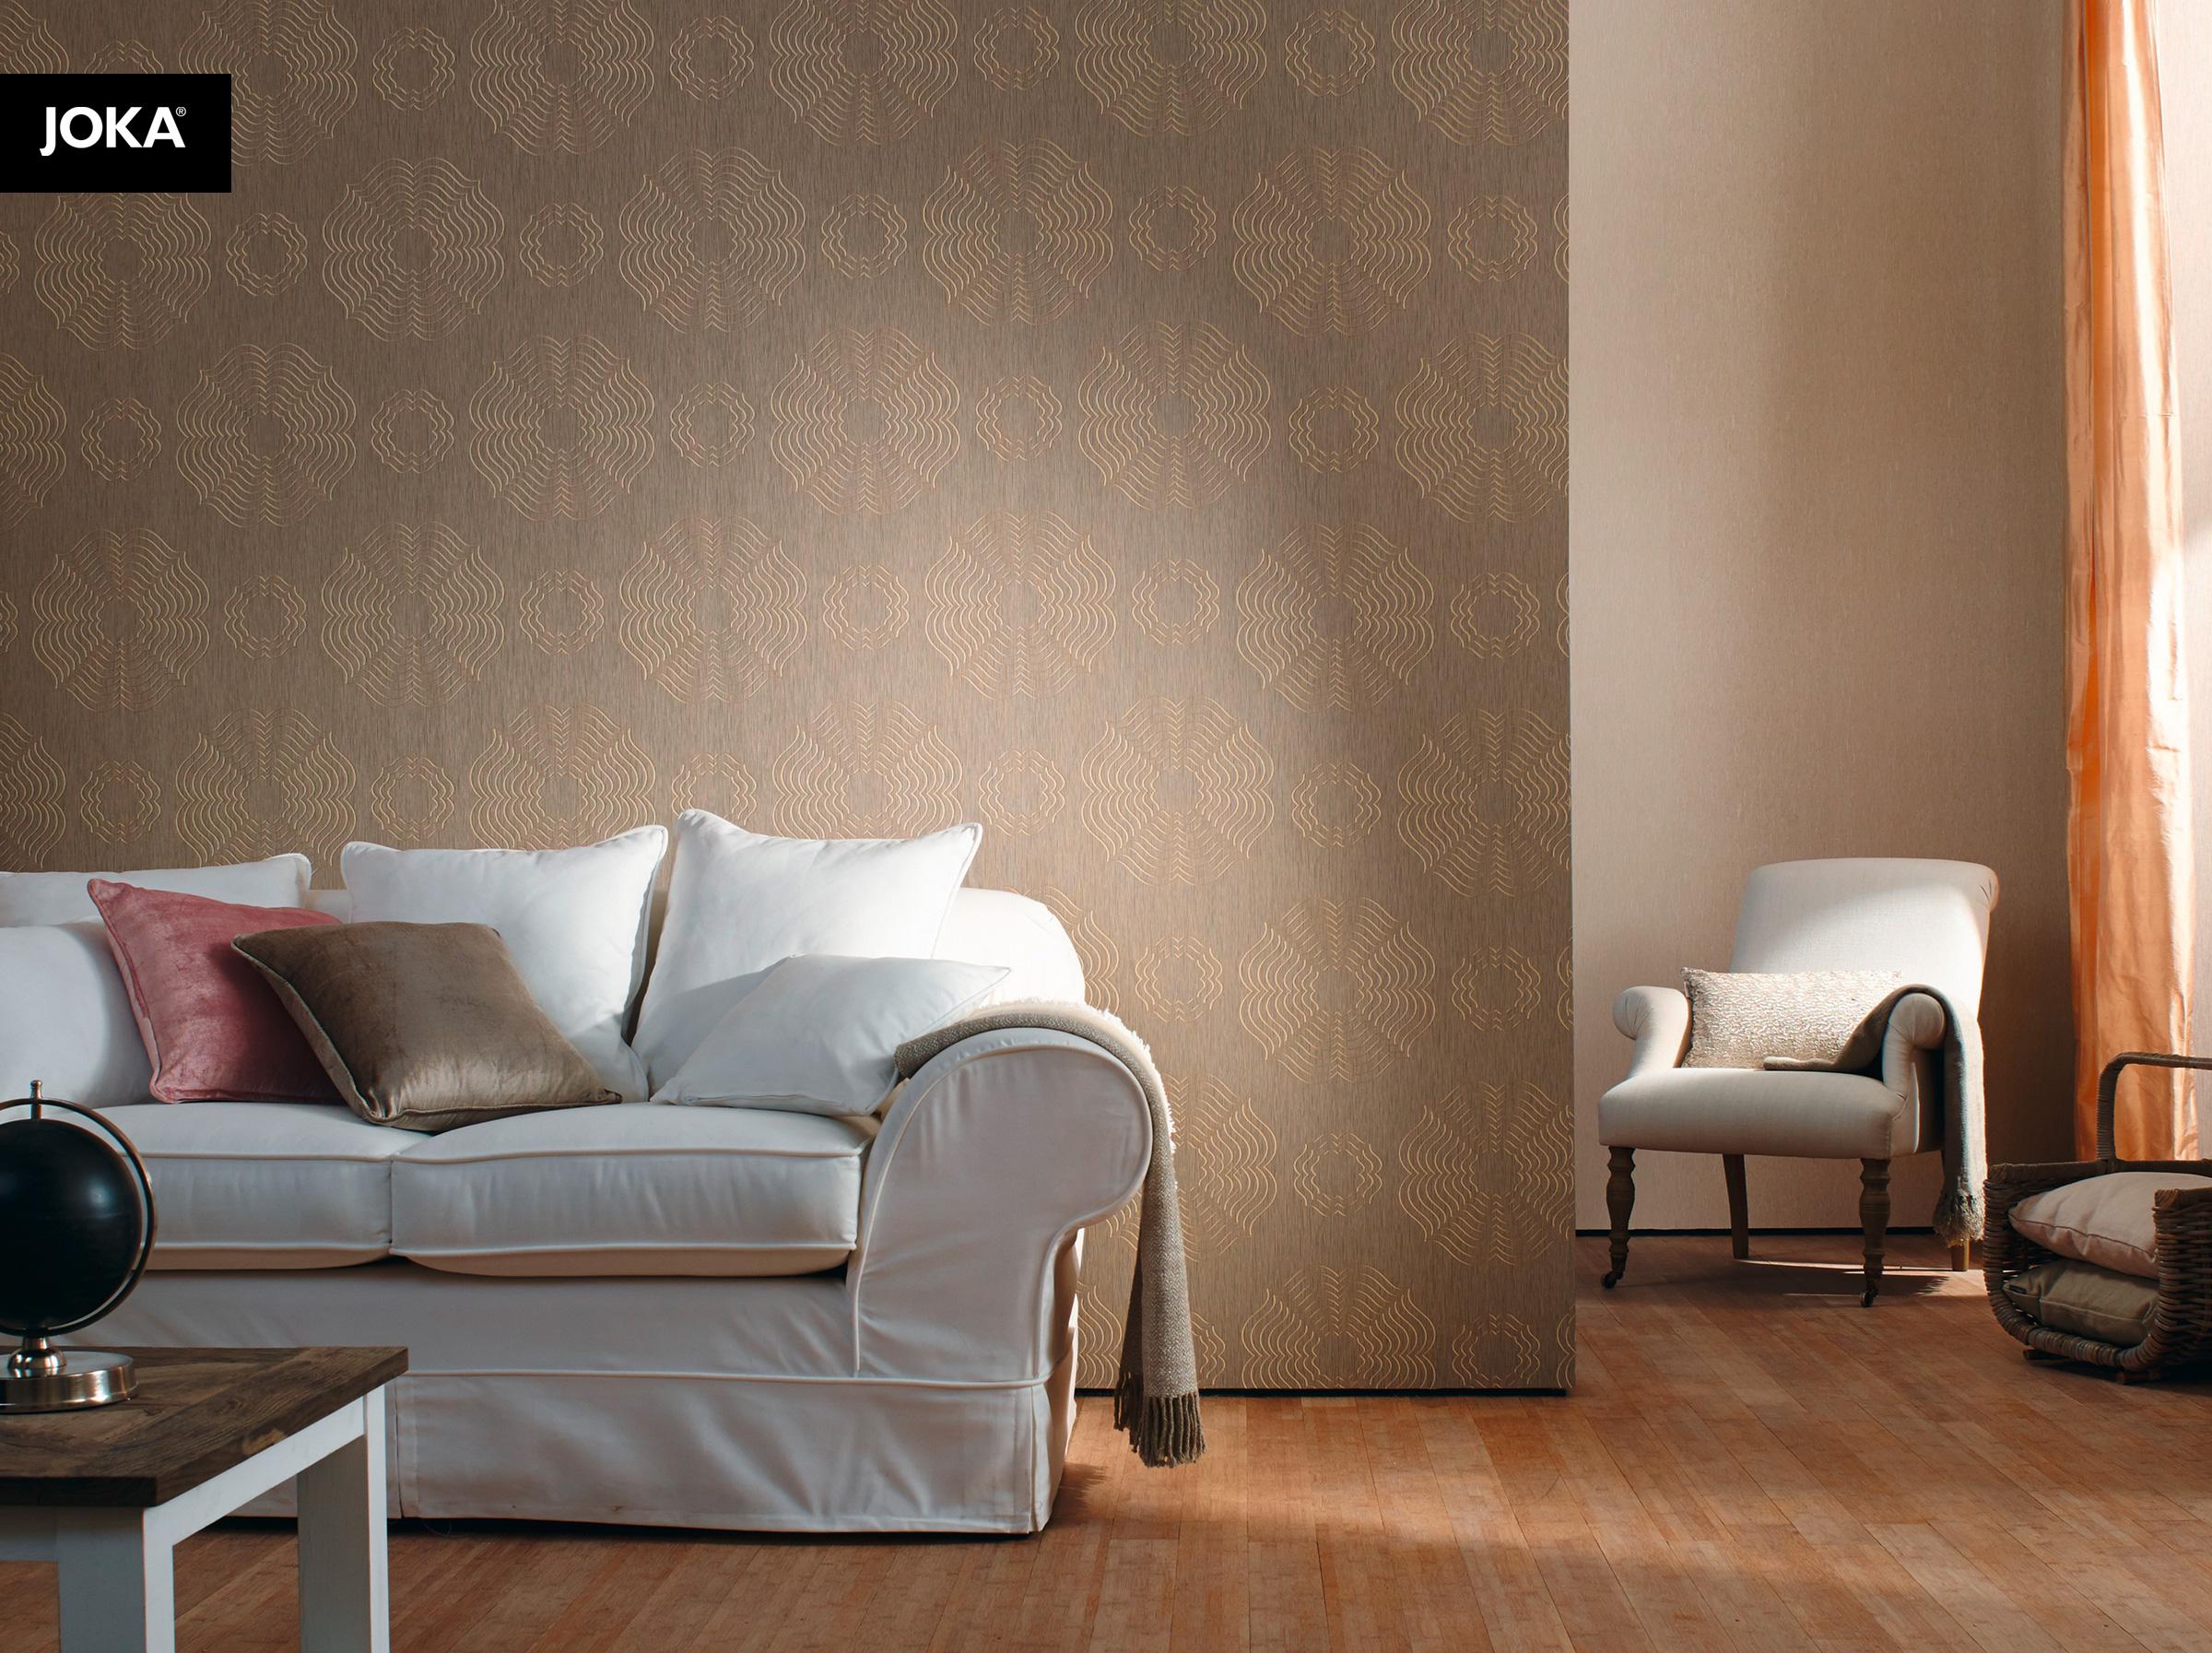 raumausstatter leipzig h ring raumgestaltung ihr. Black Bedroom Furniture Sets. Home Design Ideas